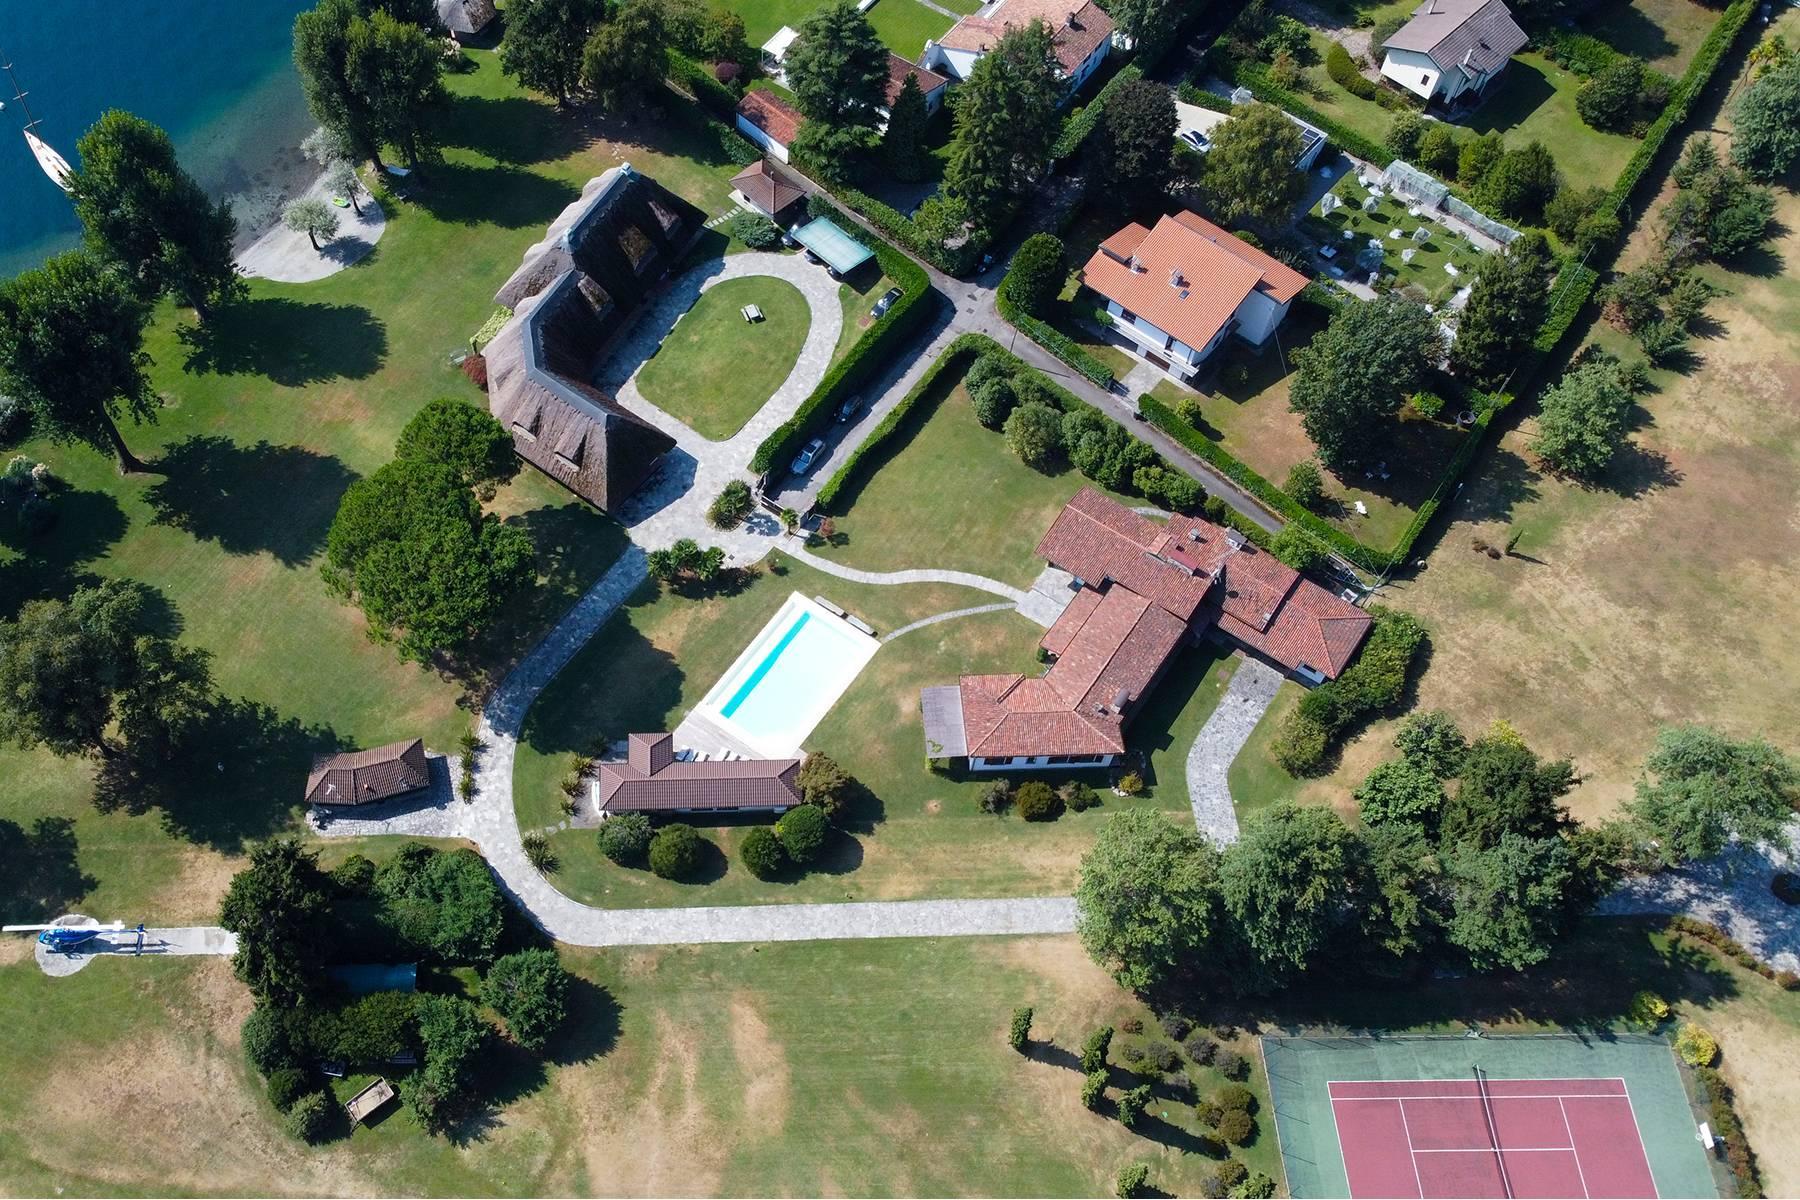 Charmante Villa in Lesa, mitten in der Natur - 38